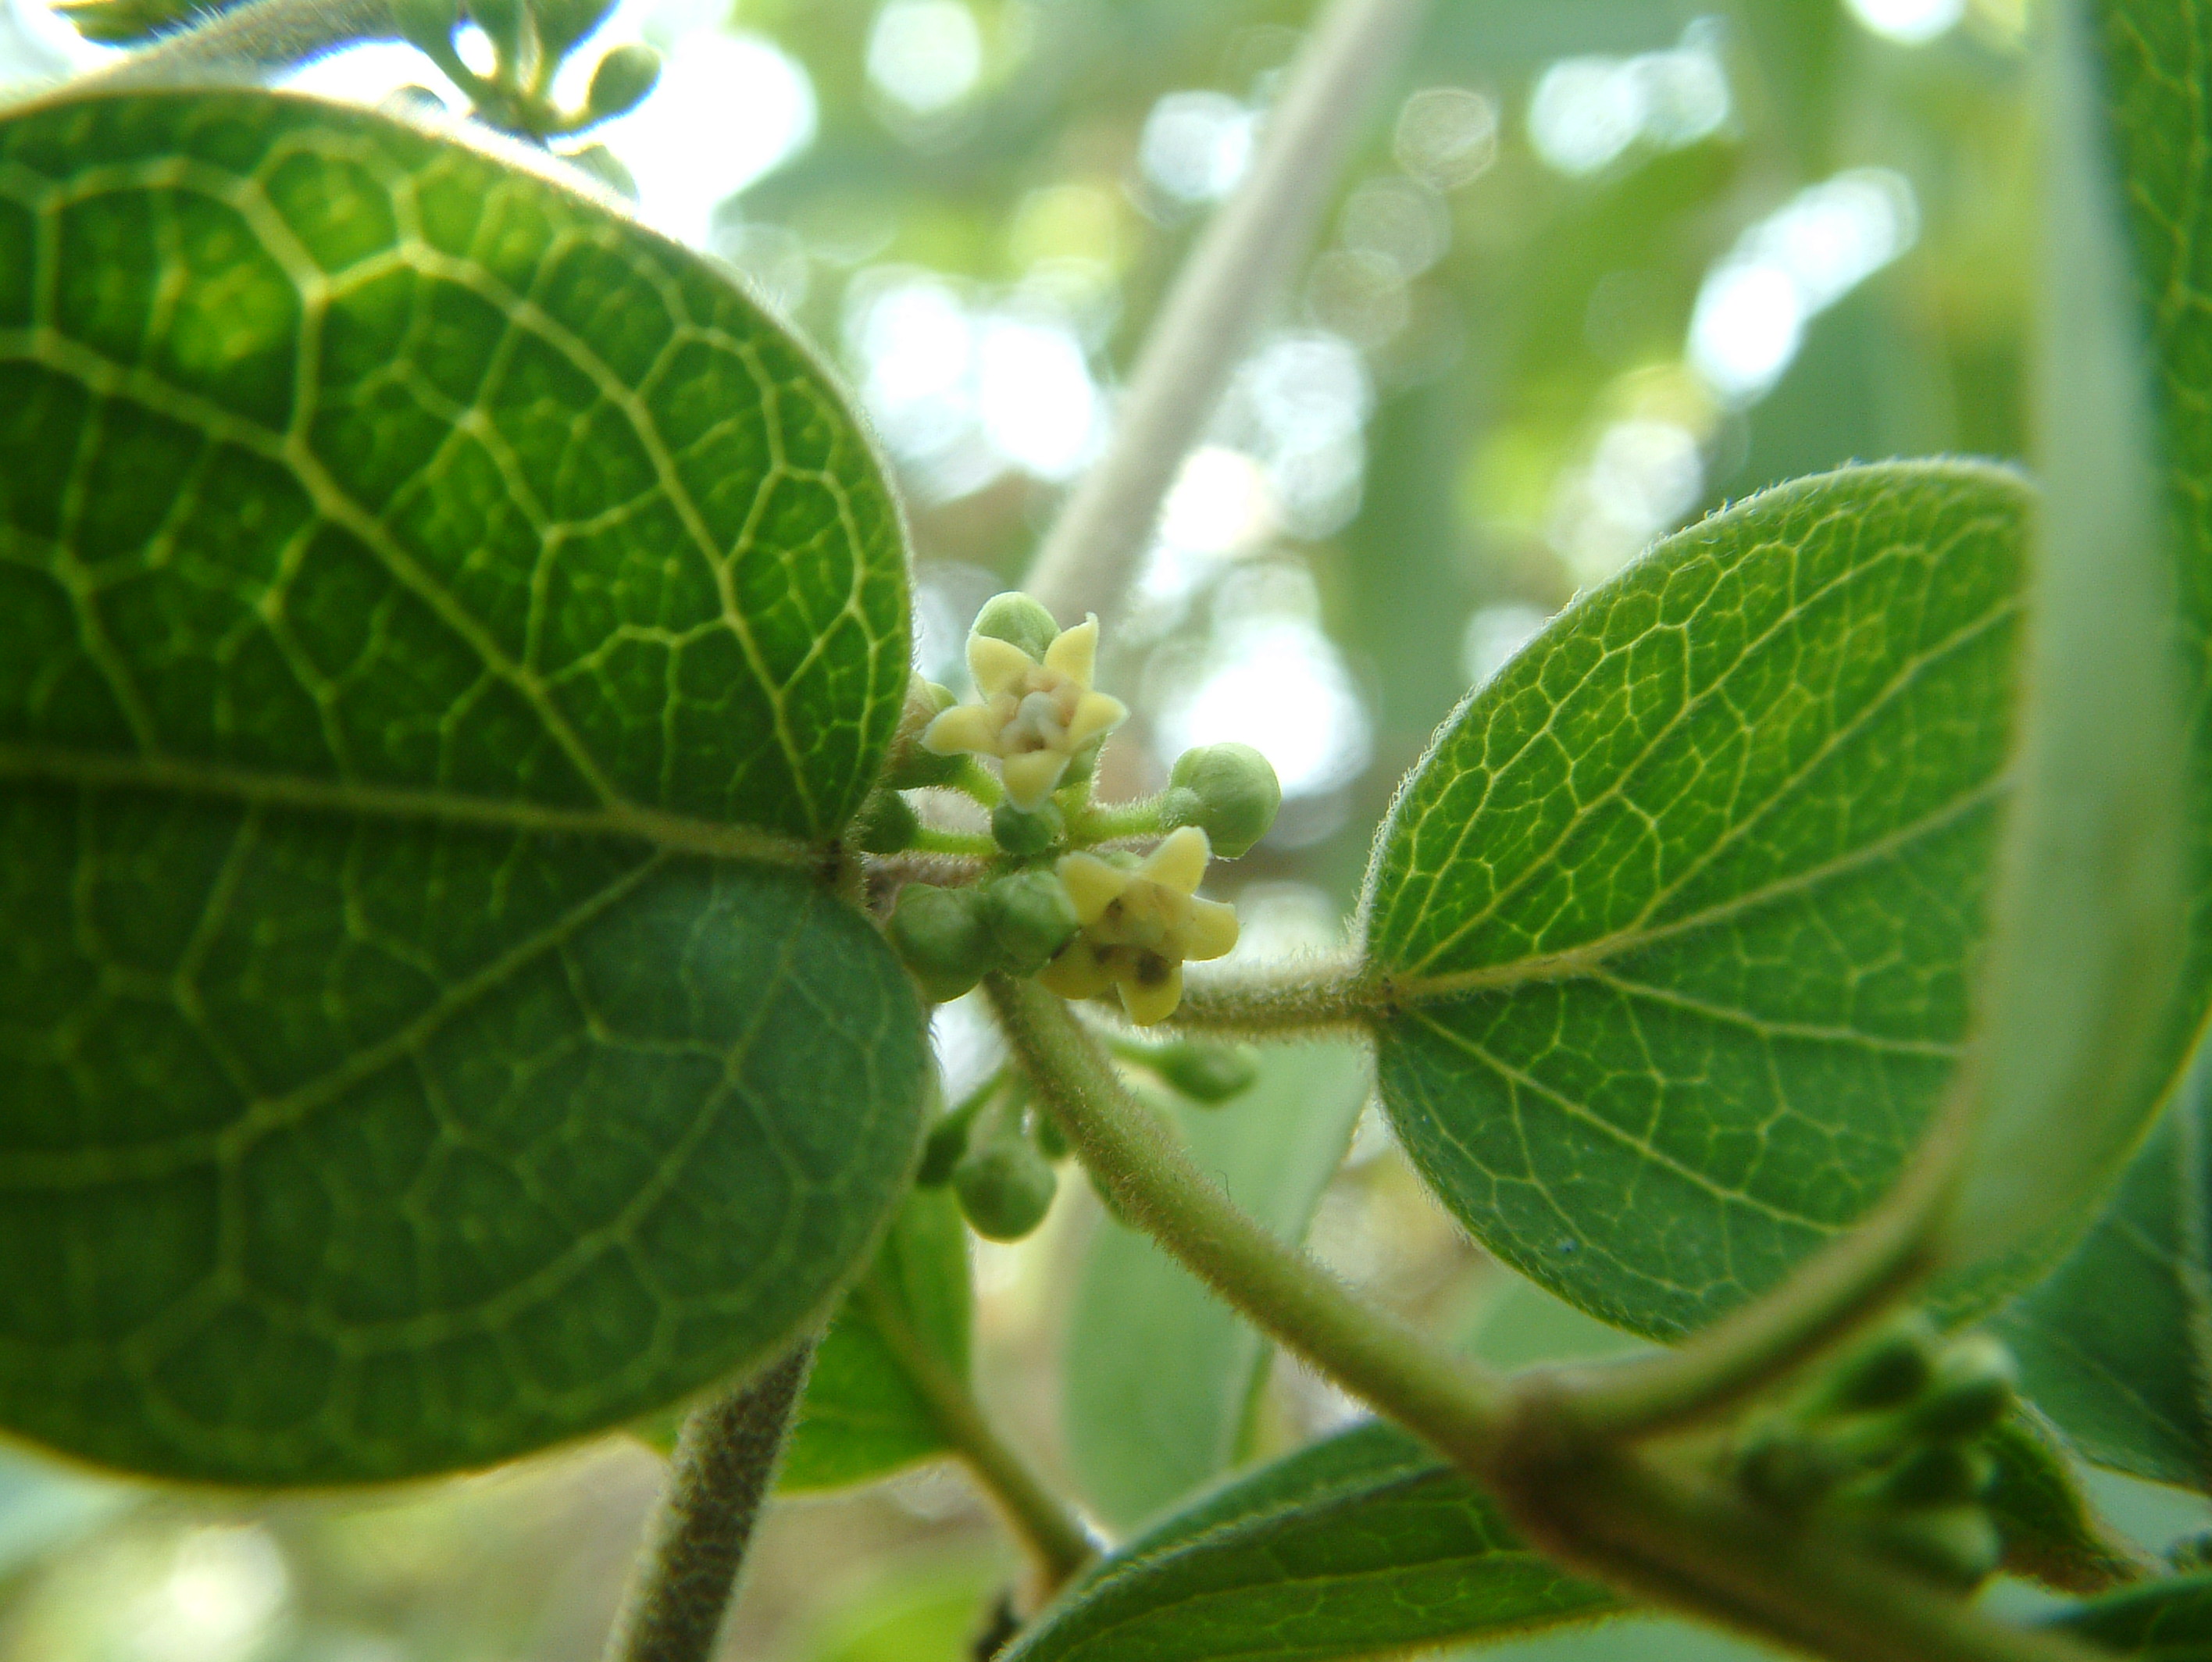 /wp-content/uploads/2020/10/Asclepiadaceae%20member.JPG